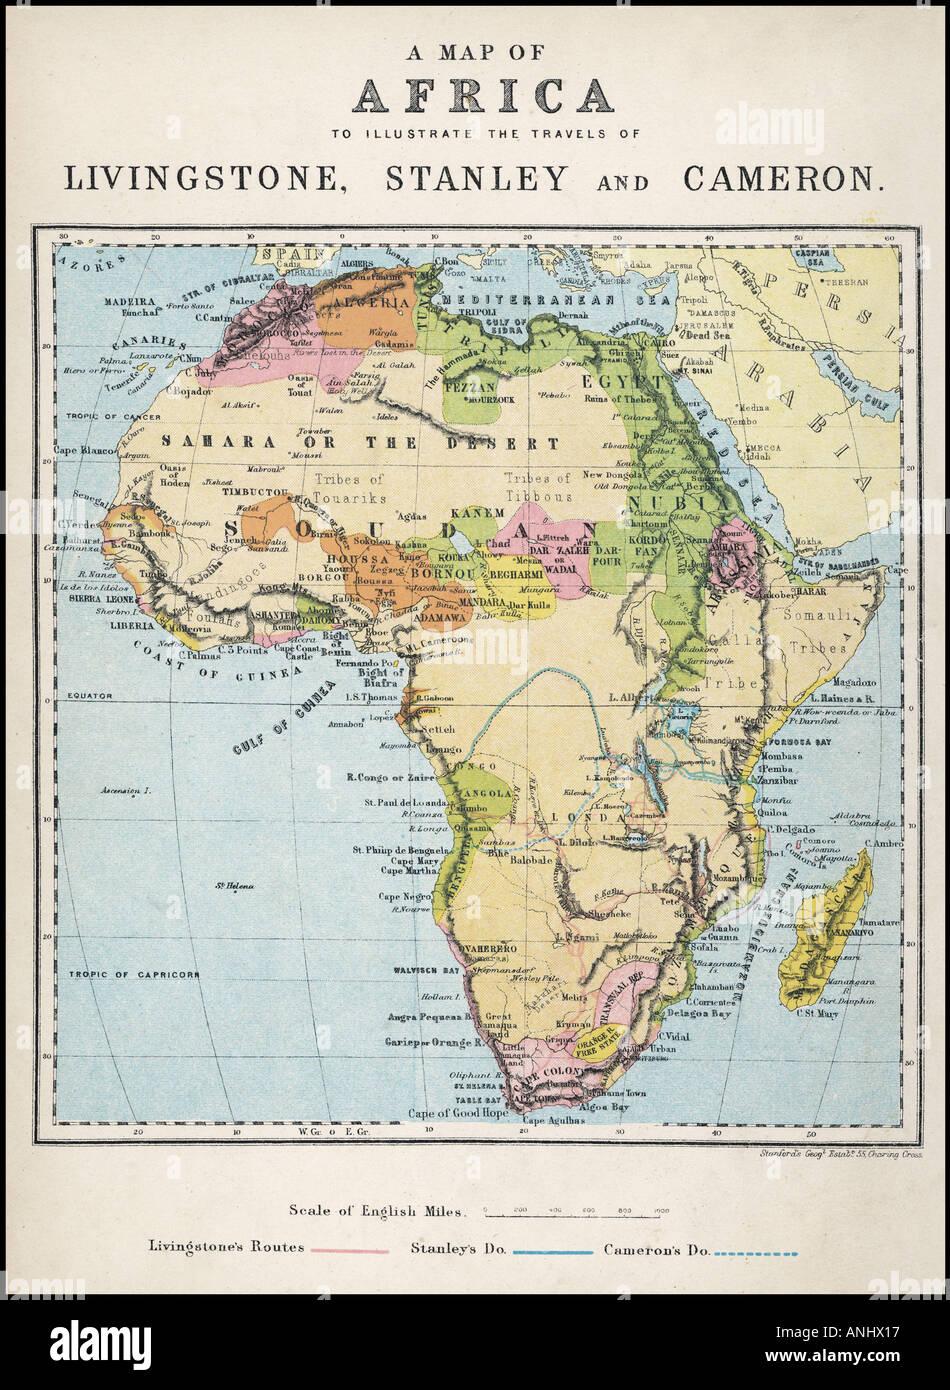 Cameron Map Africa Stock Photo: 5072406   Alamy